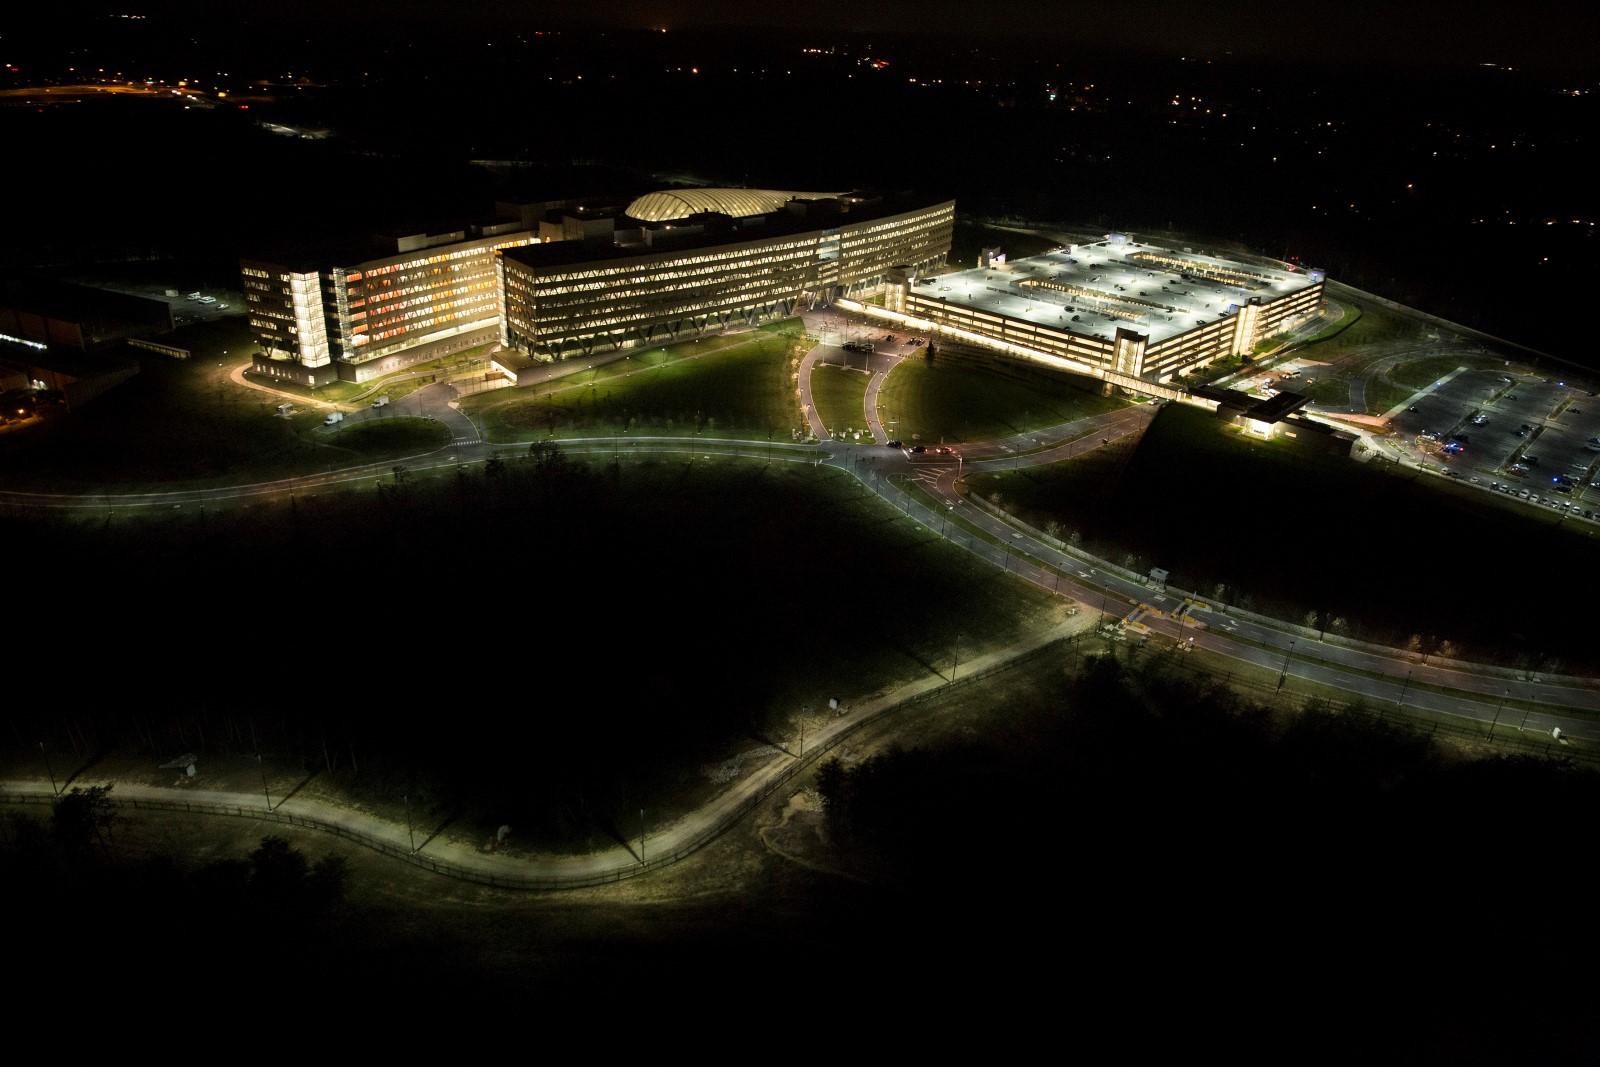 National_Geospatial-Intelligence_Agency,_2013 (Custom)